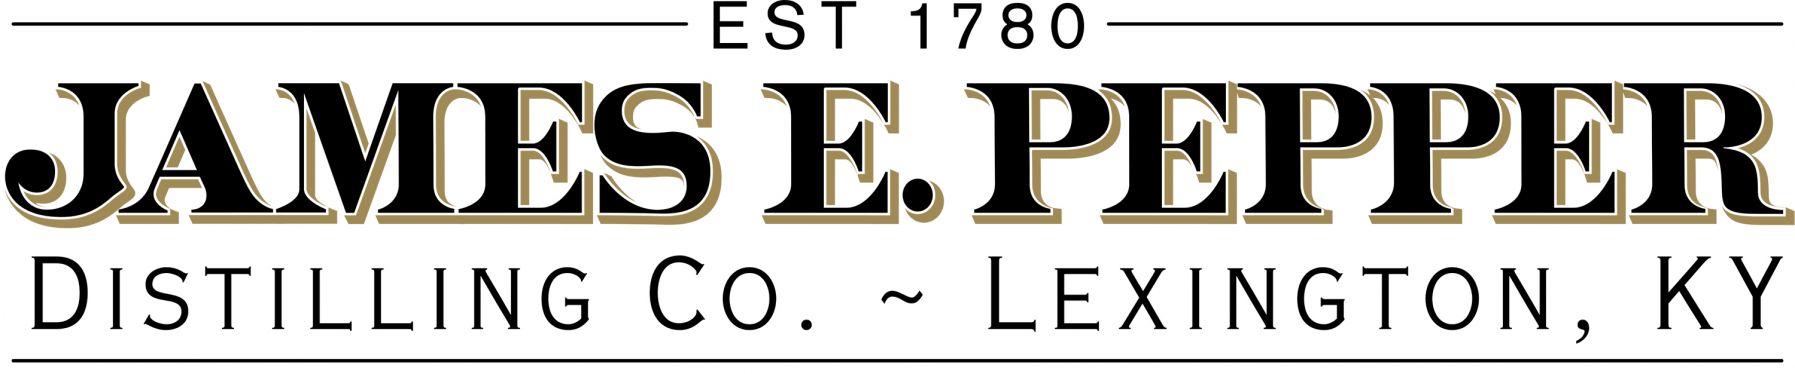 James Pepper Distilling Co. Logo